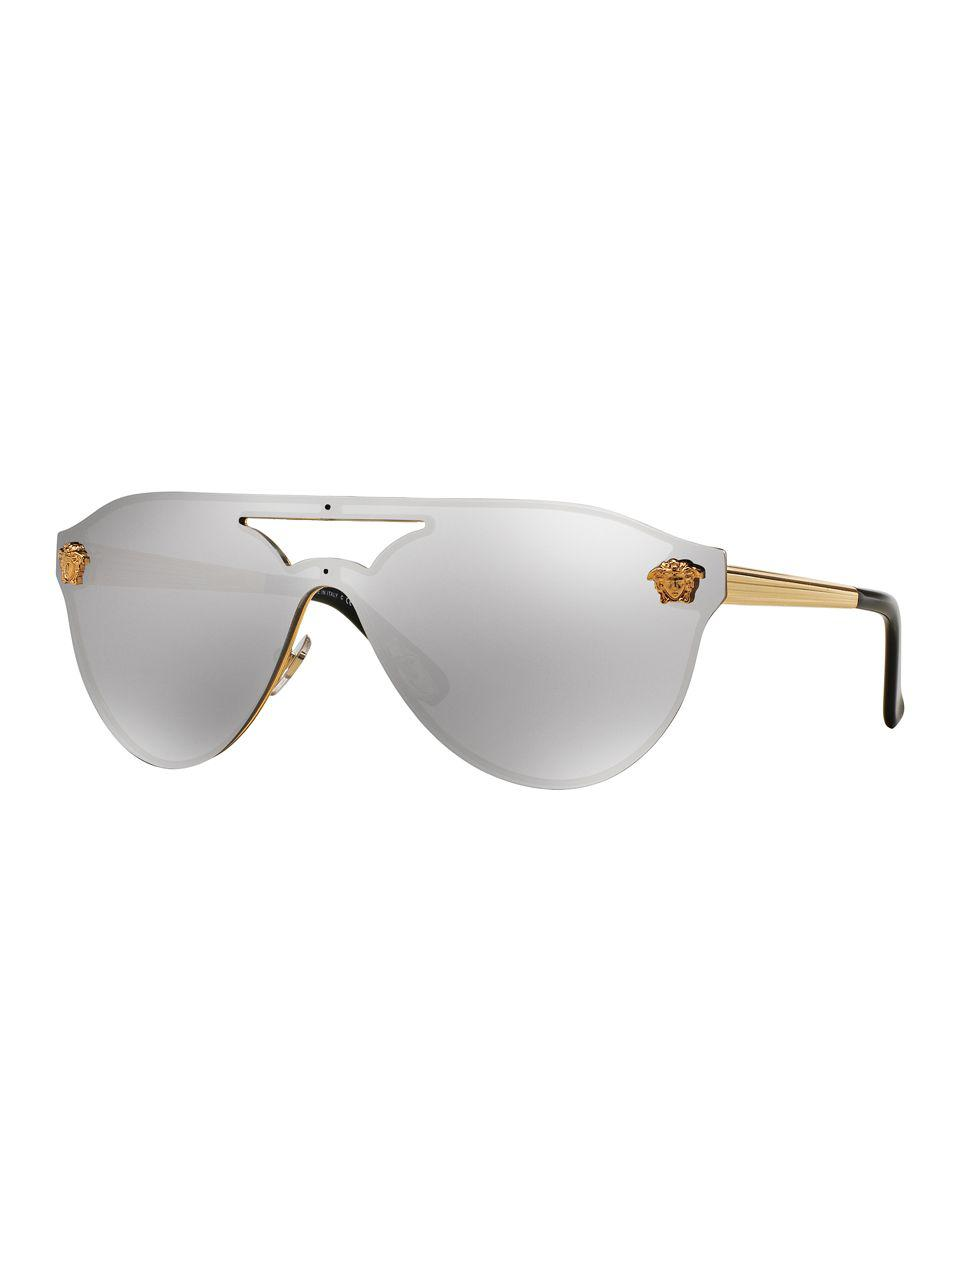 3621c296c9c1 Lyst - Versace 42mm Mirrored Pilot Sunglasses in Metallic - Save 5%